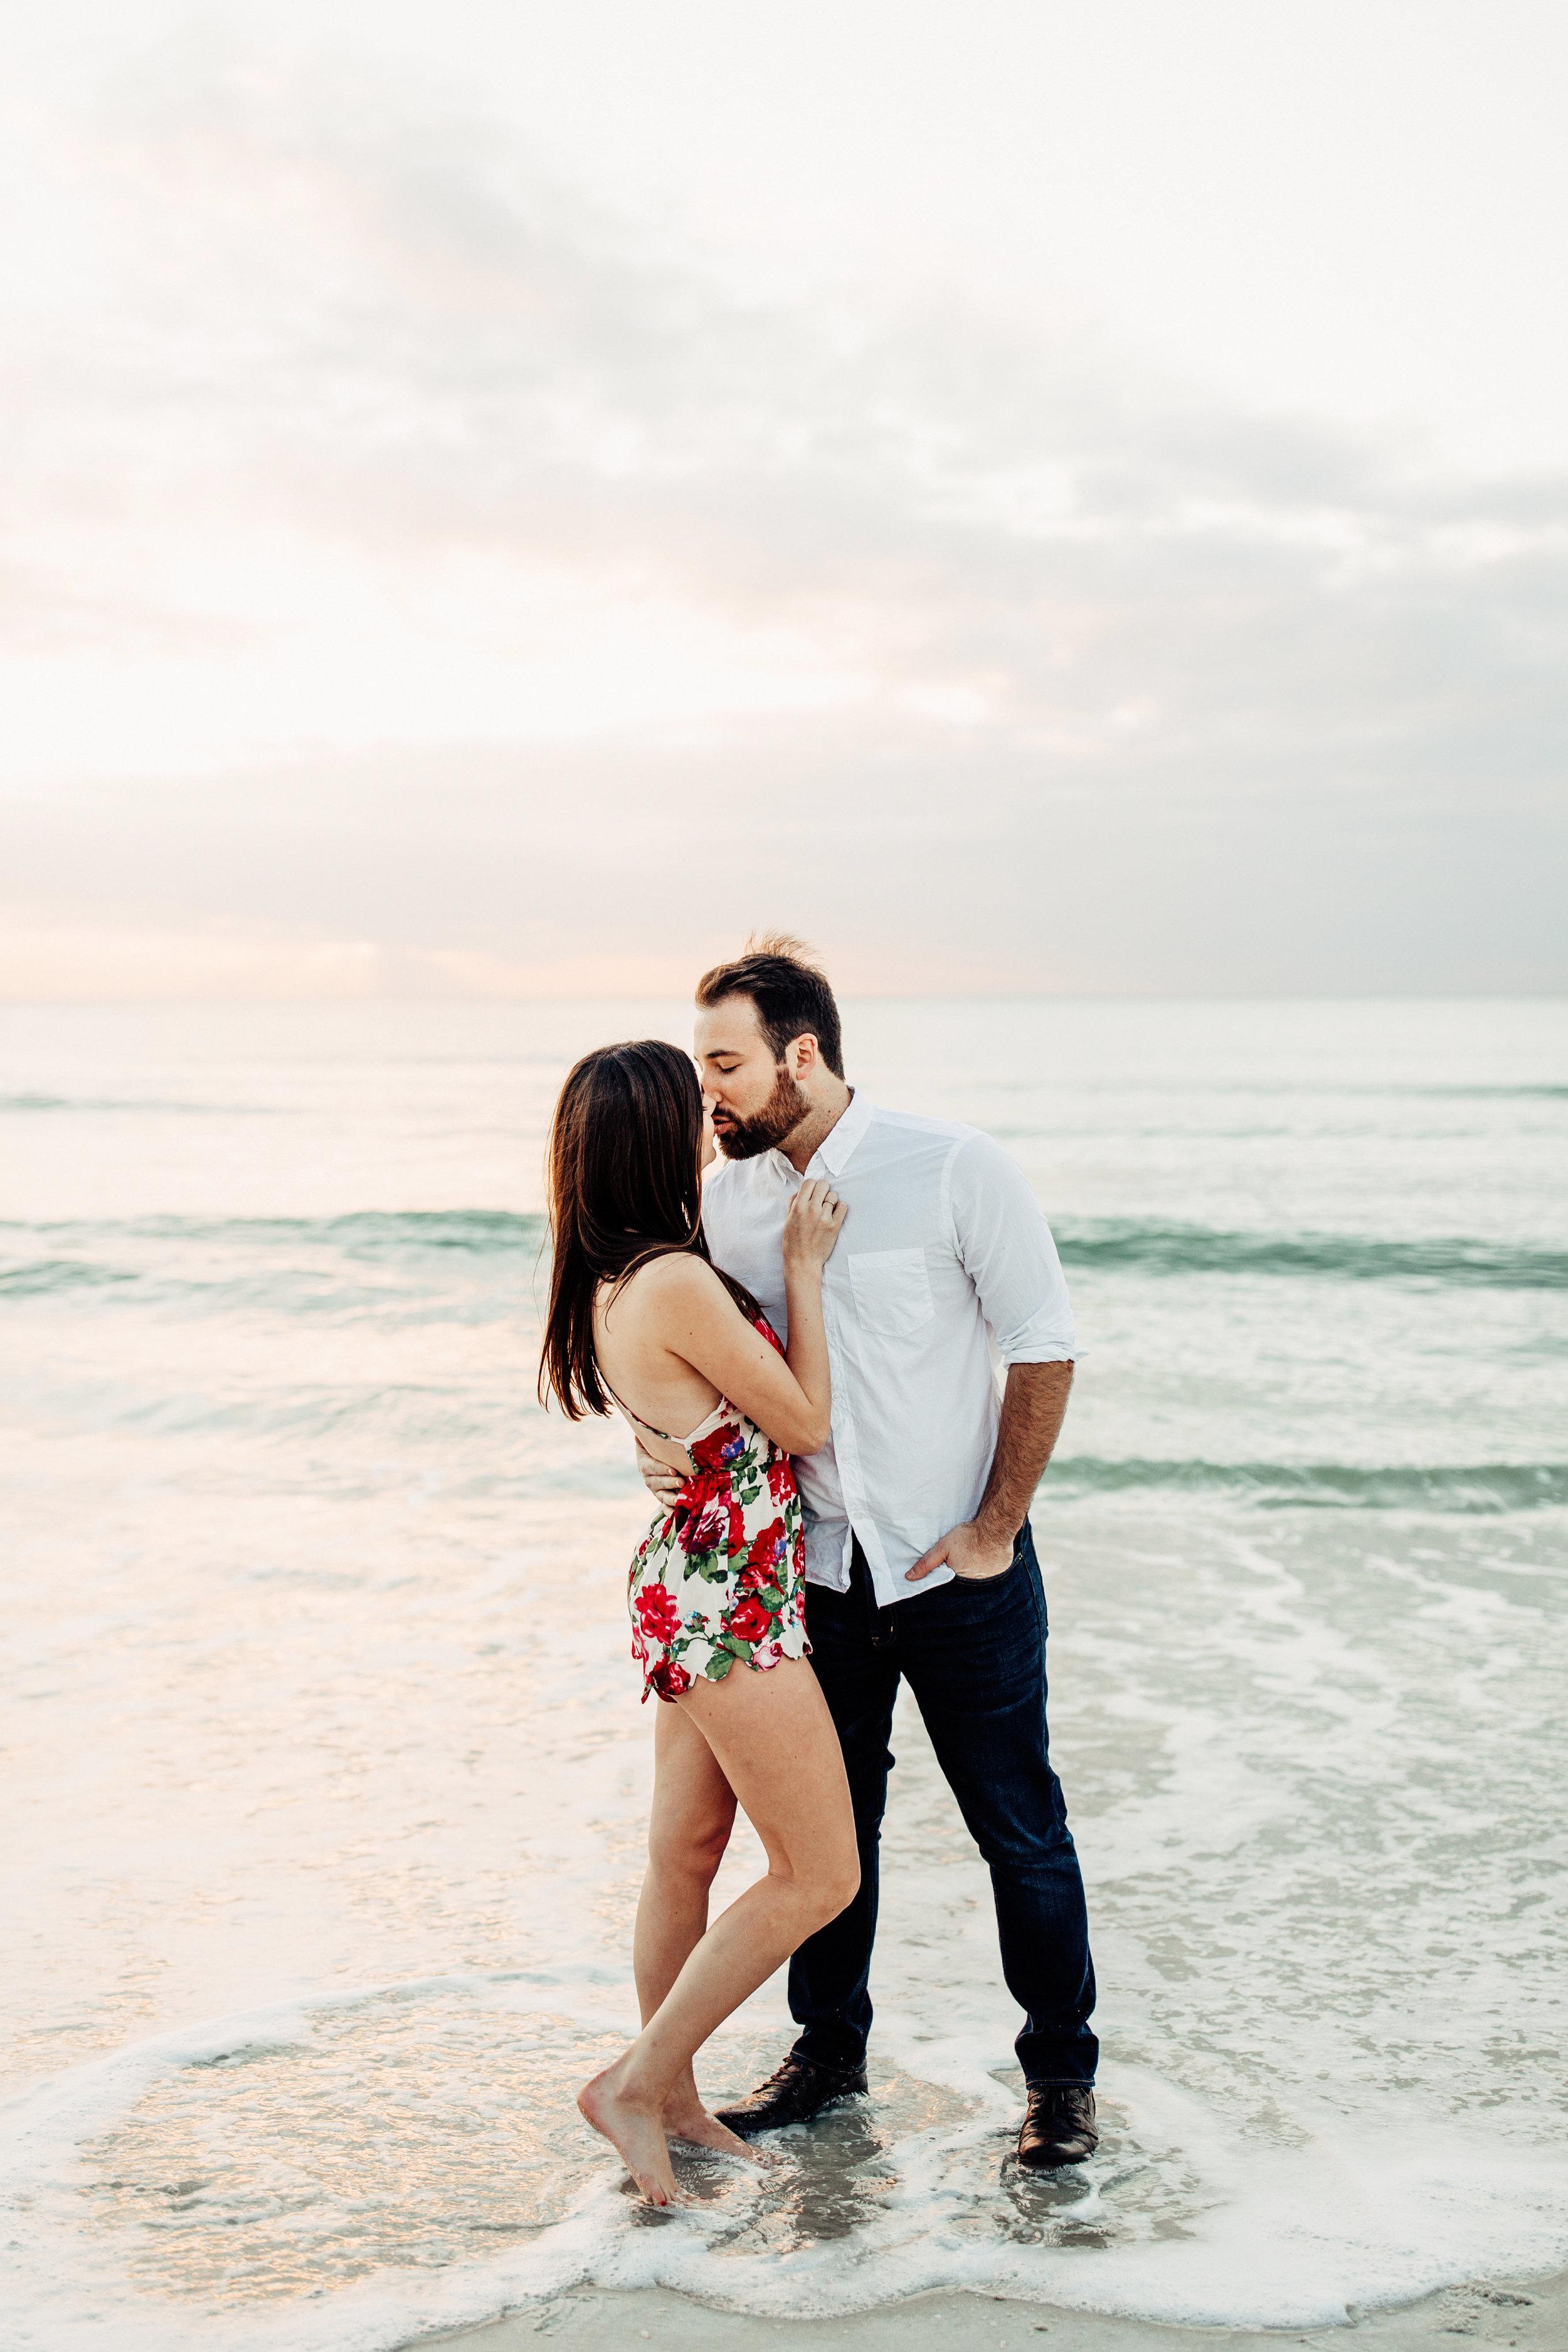 oahu-hawaii-wedding-photographer-110-finalA.JPG